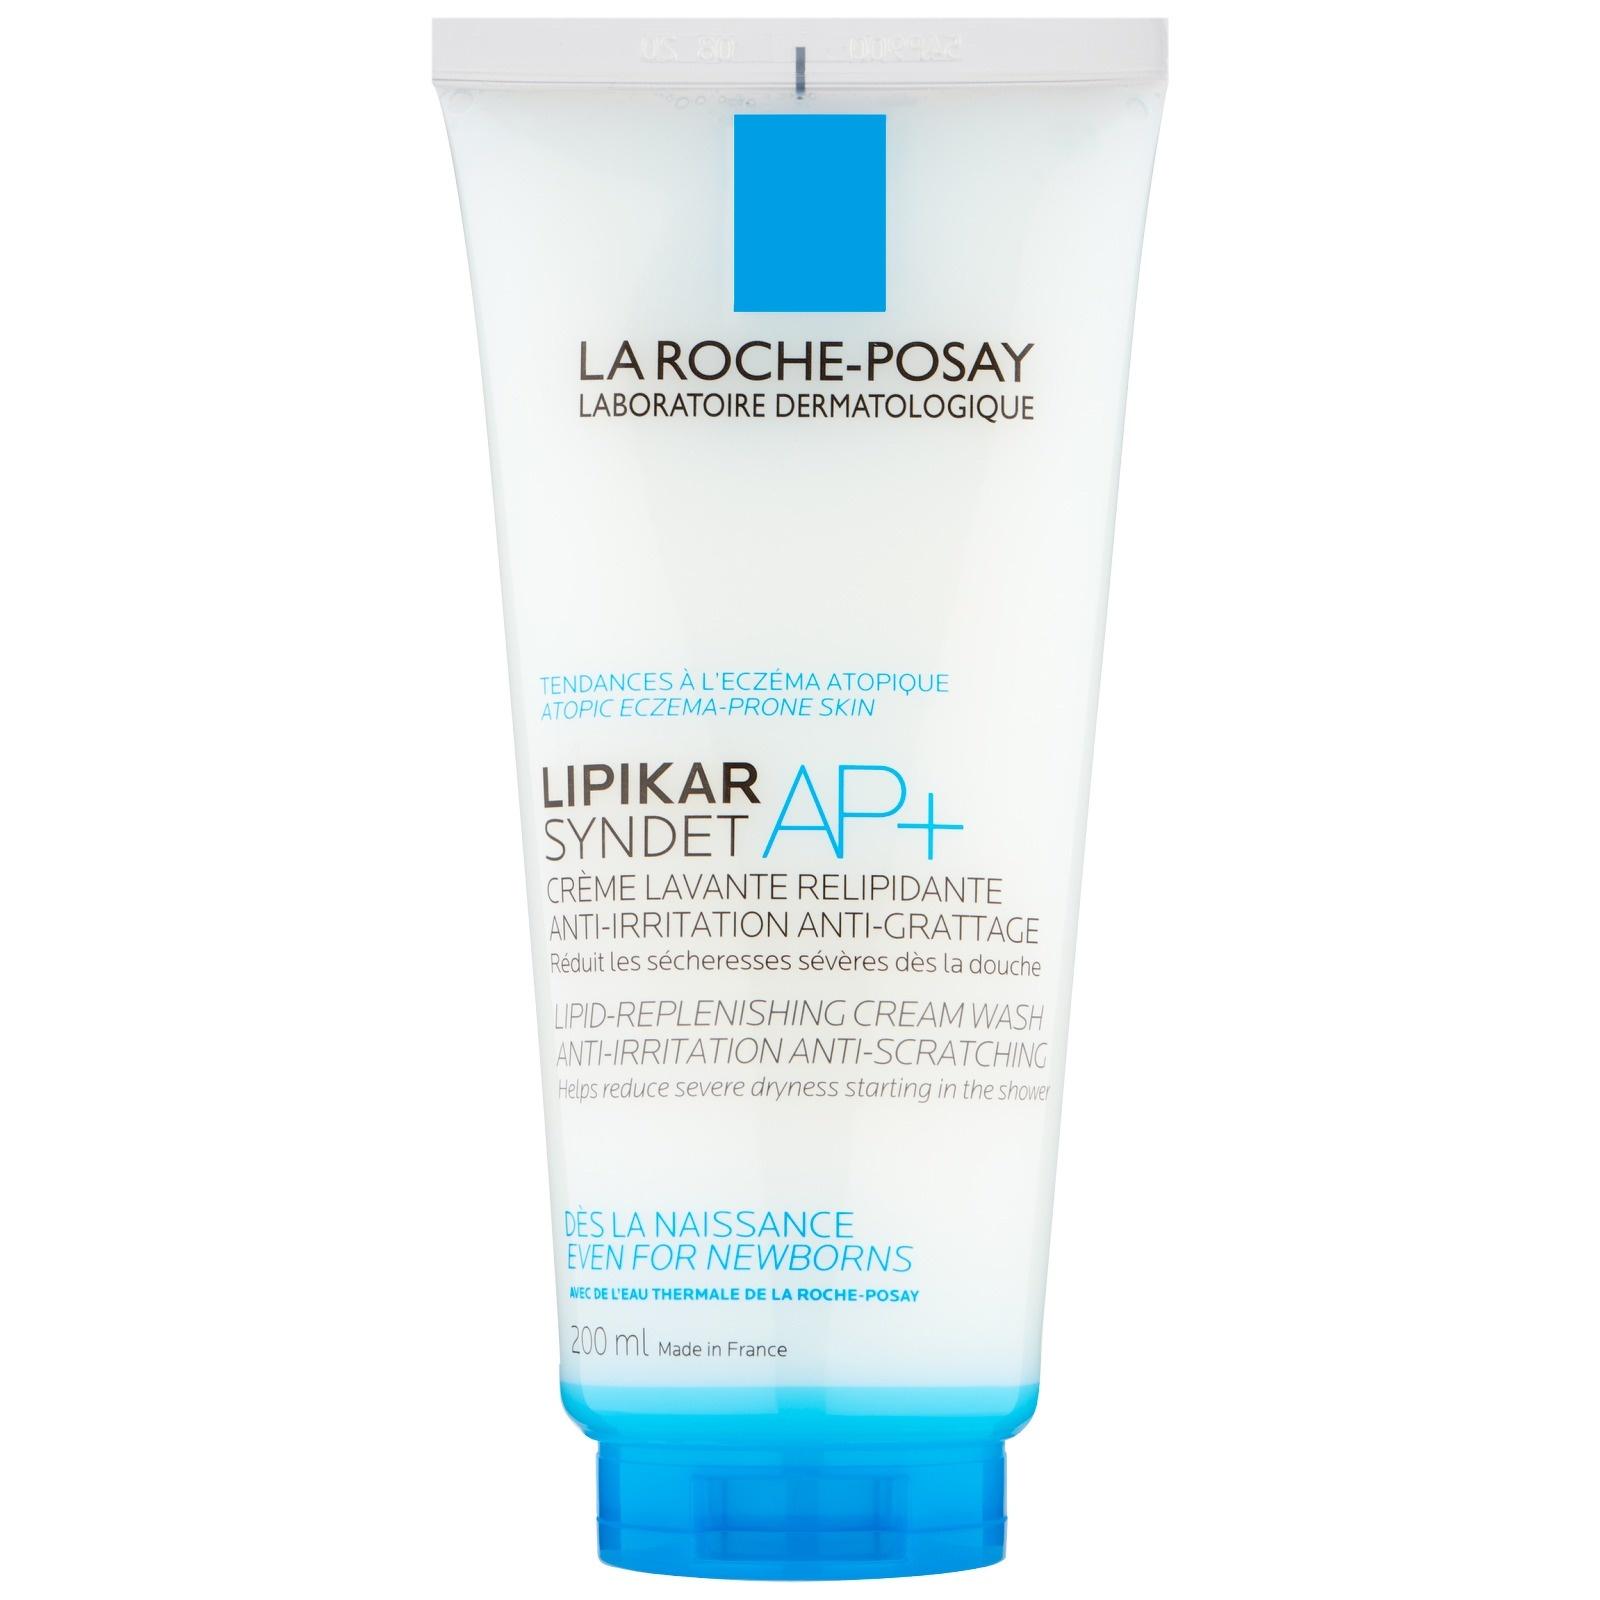 La Roche-Posay Lipikar Syndet AP+ - Lipid Replenishing Cream Wash 200ml